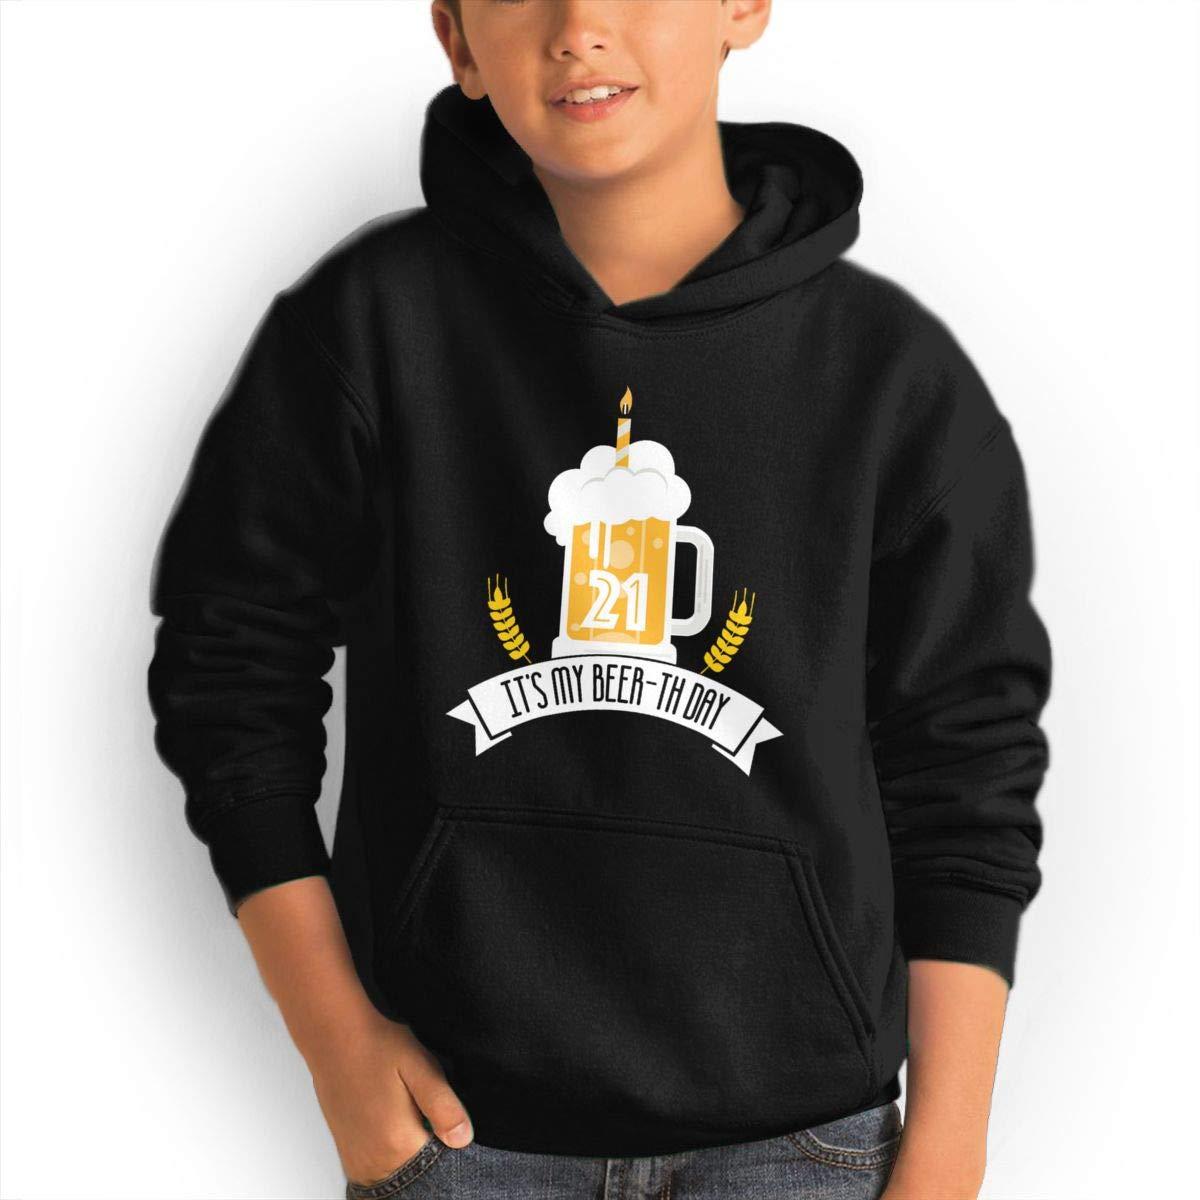 GUFEIFEIN Its My Beer-th Day Youth Boys/Girls Hoodie Sweatshirt Hooded with Pocket by GUFEIFEIN